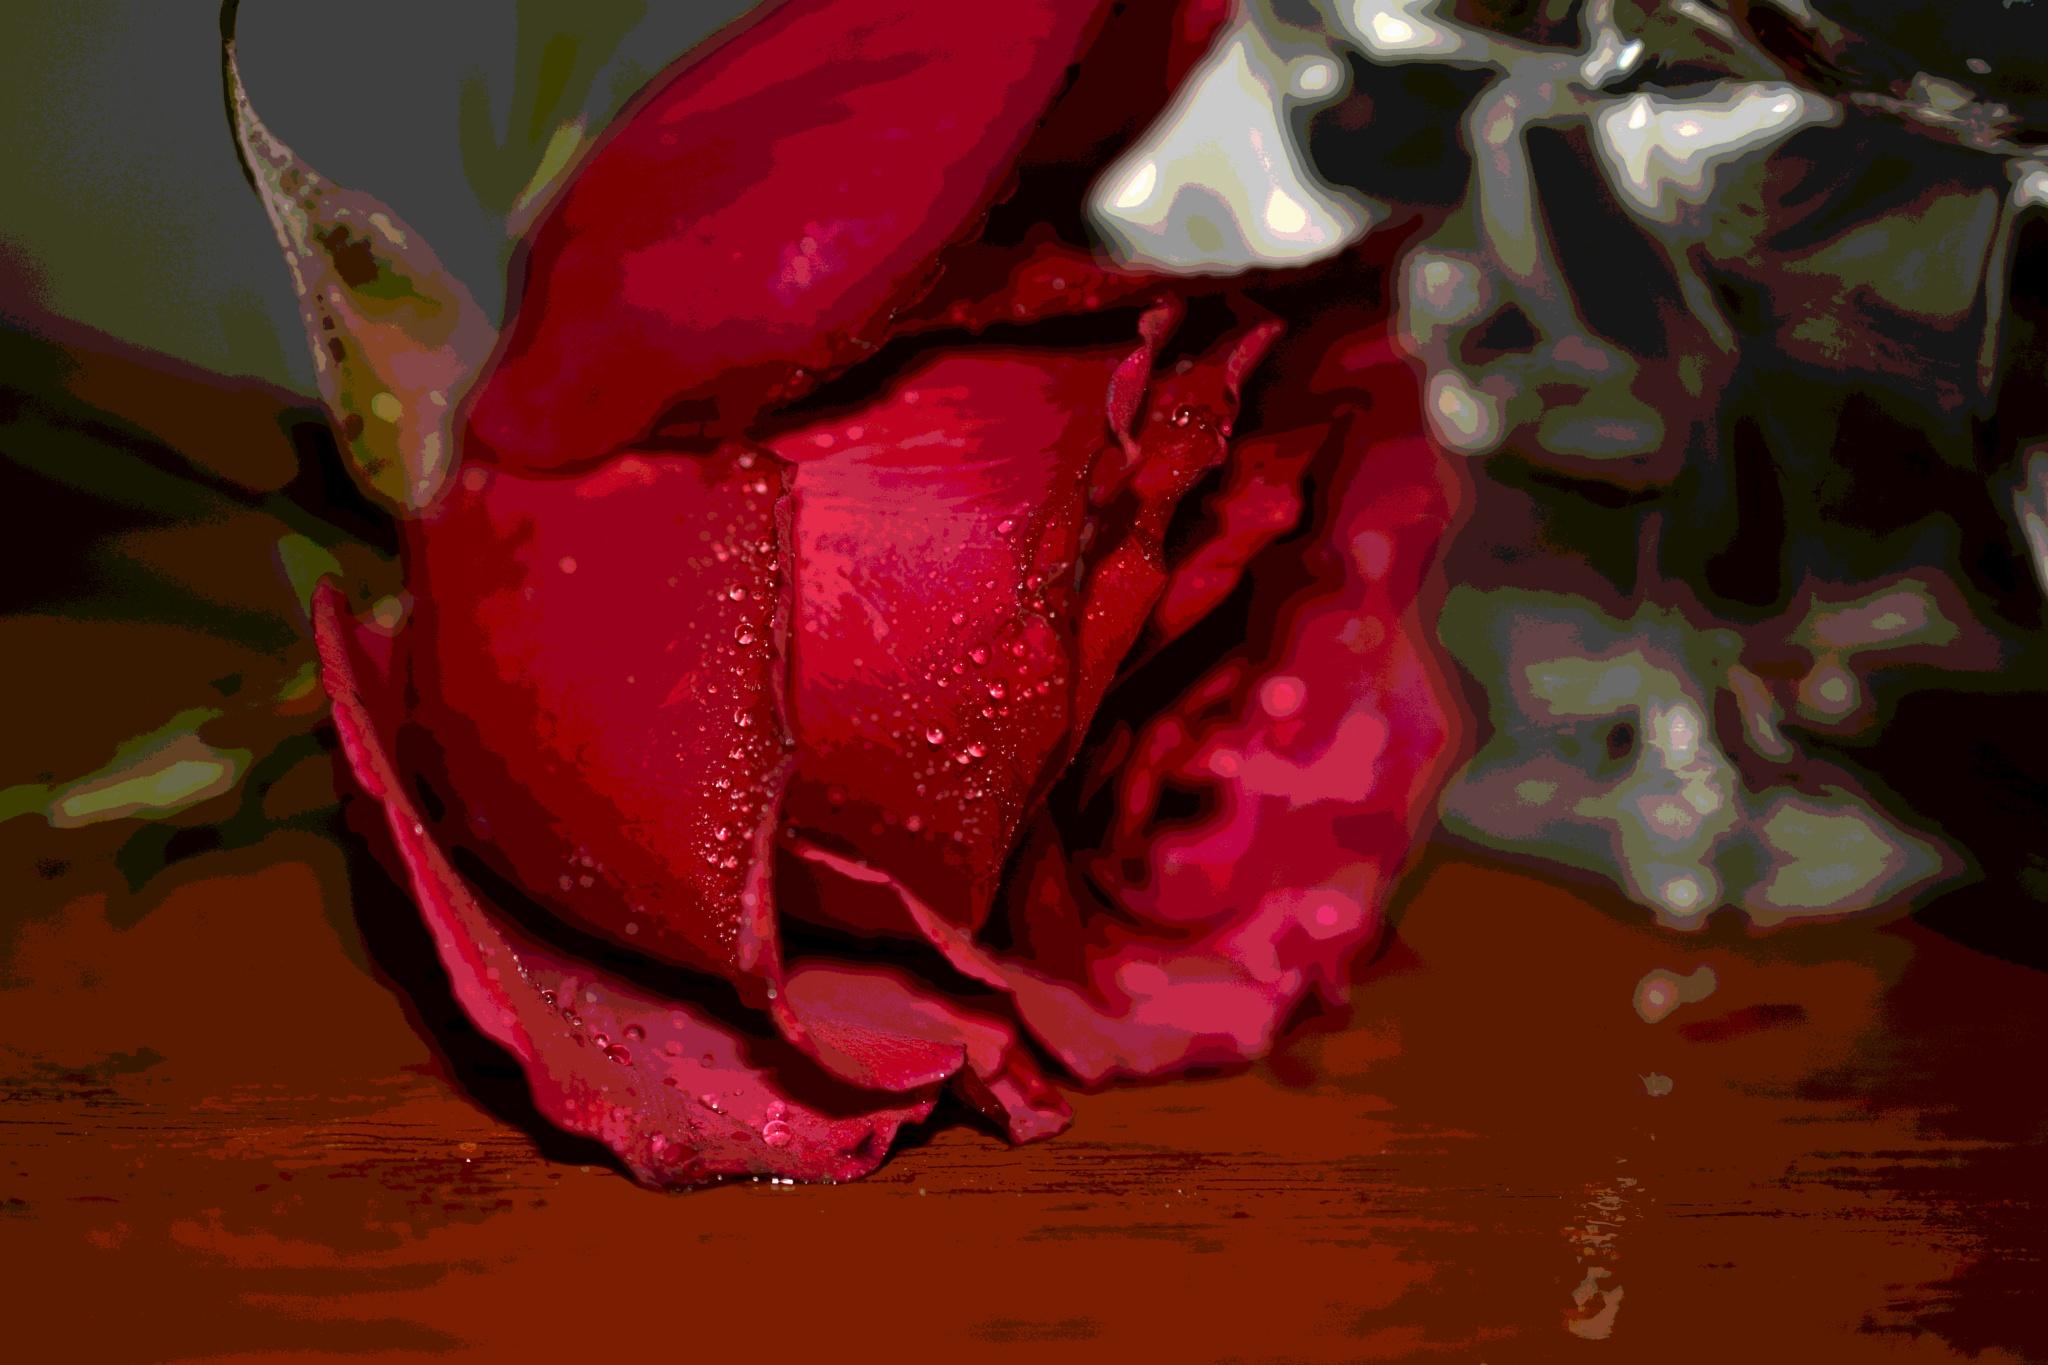 red rose4 by pgavin5000